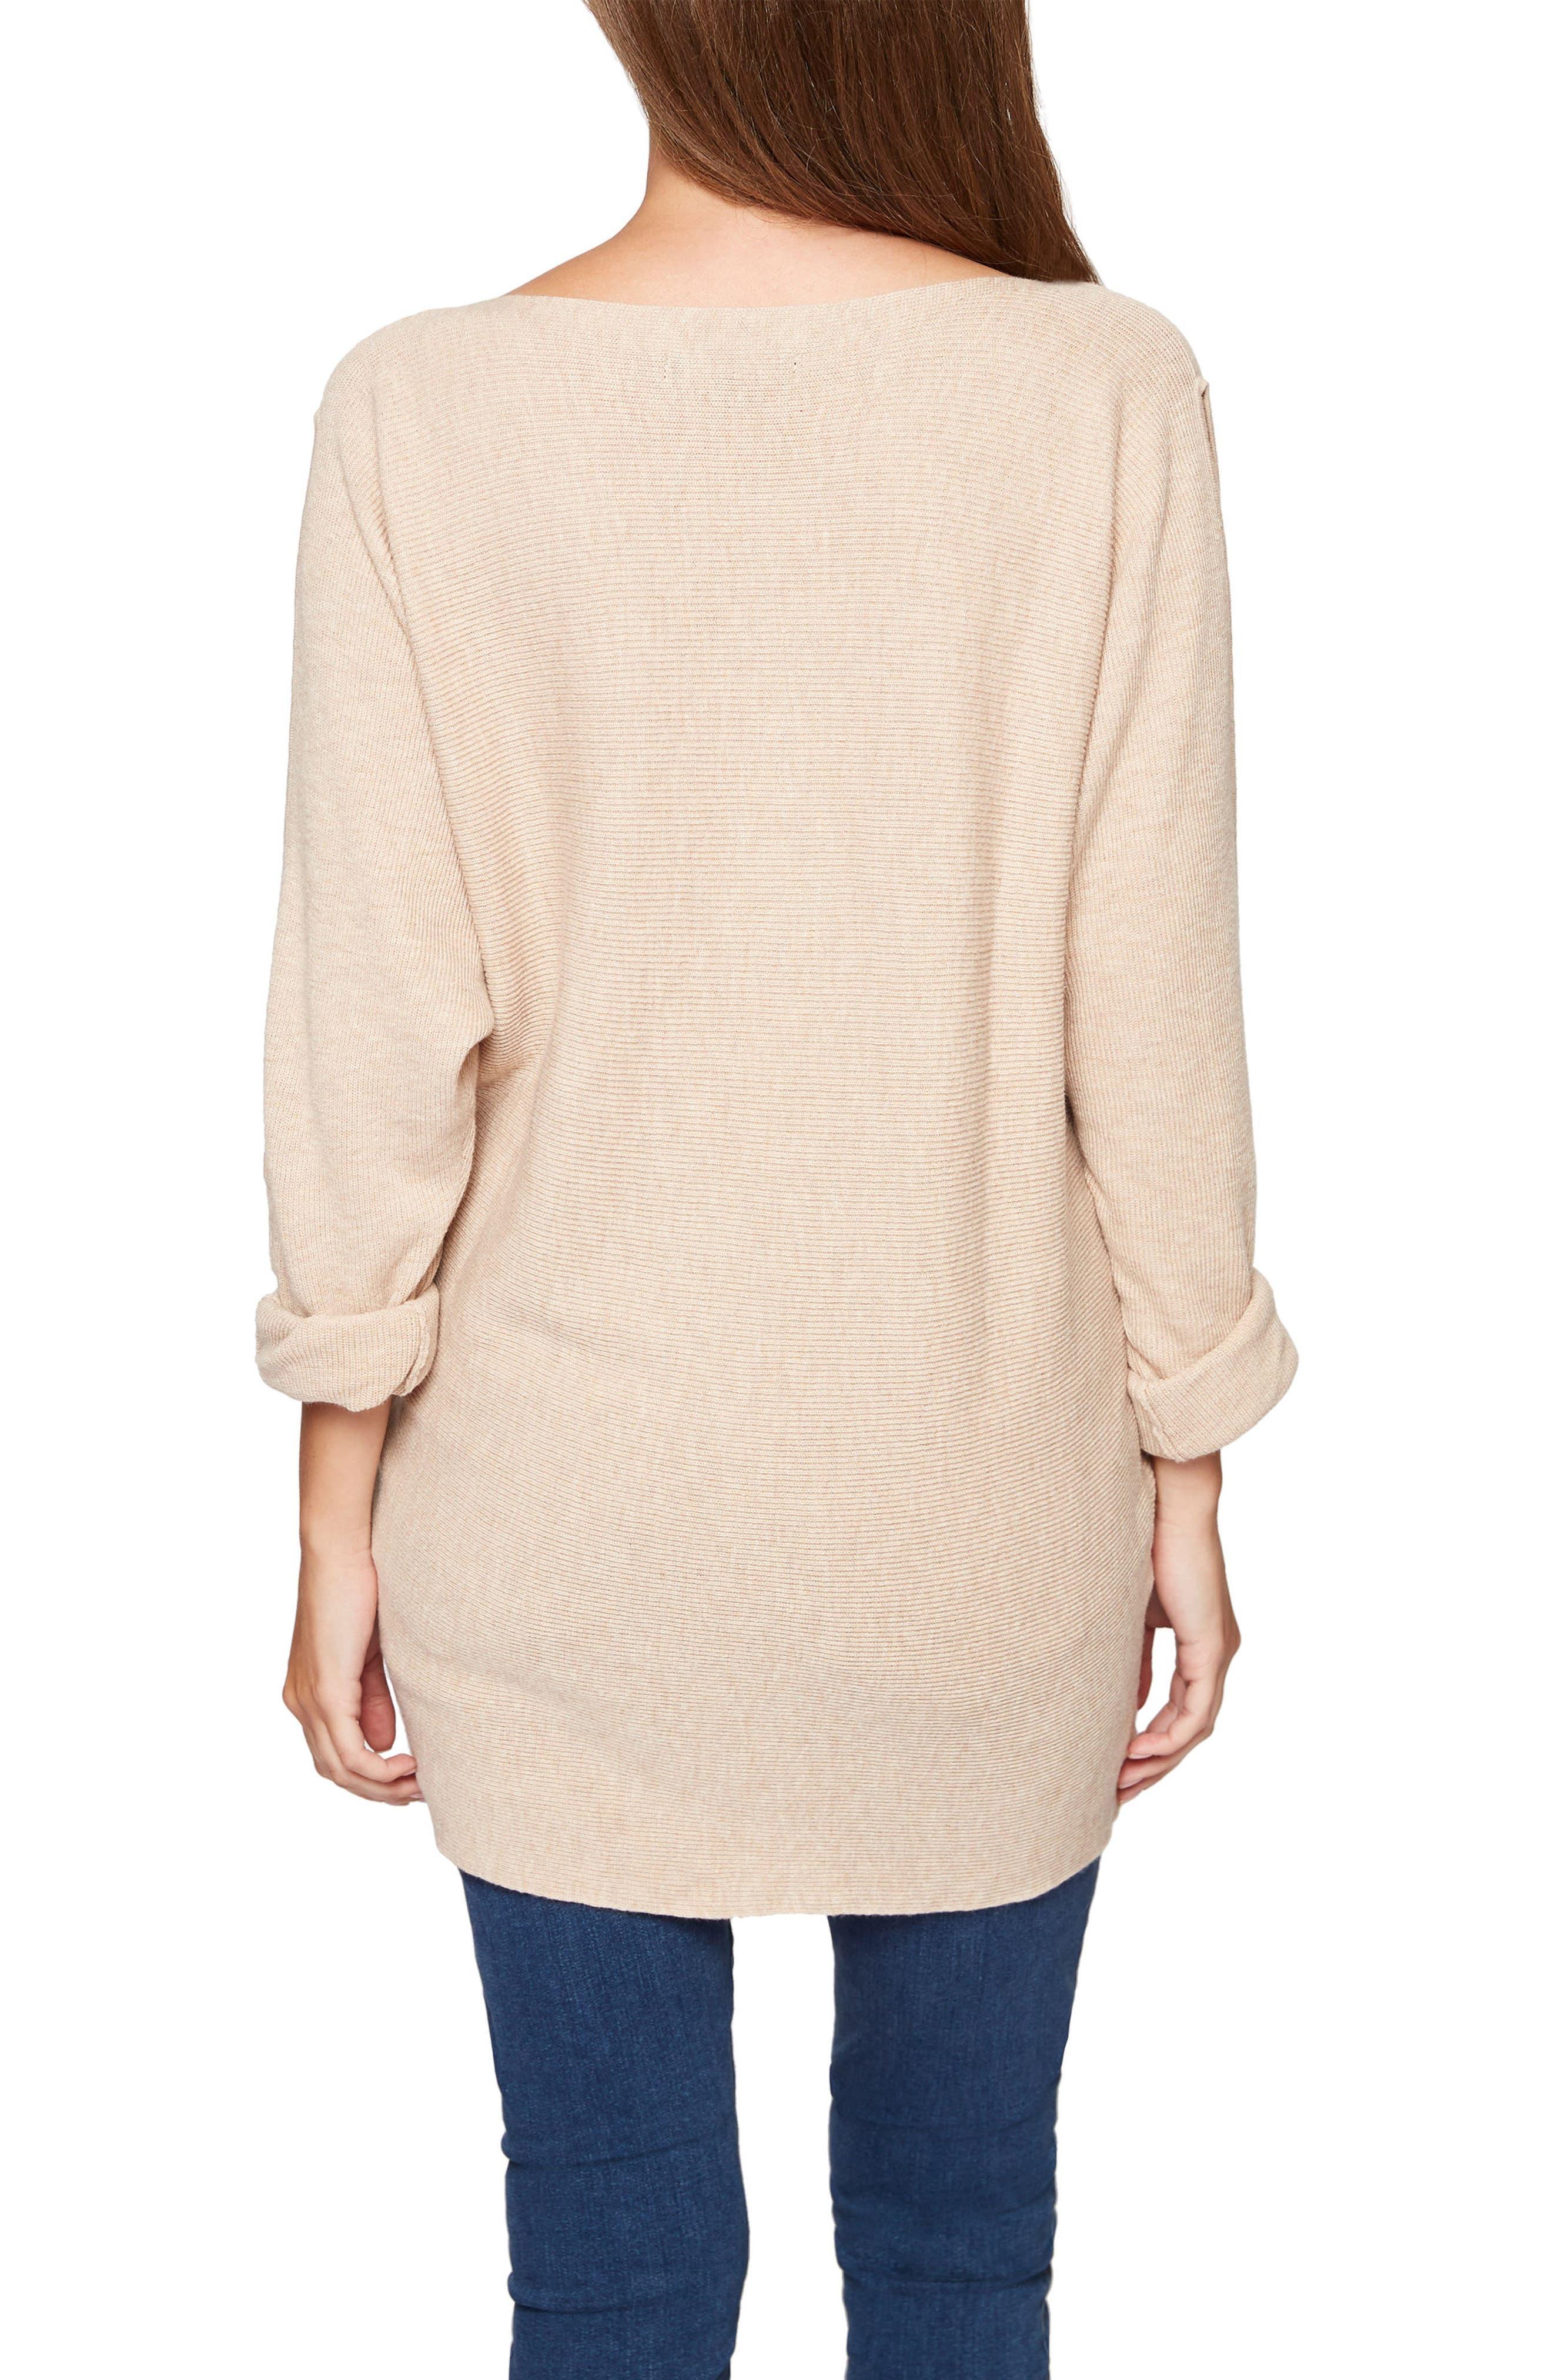 Sancutary Gillian Bare Shoulder Cutout Tunic Sweater,                             Alternate thumbnail 2, color,                             259